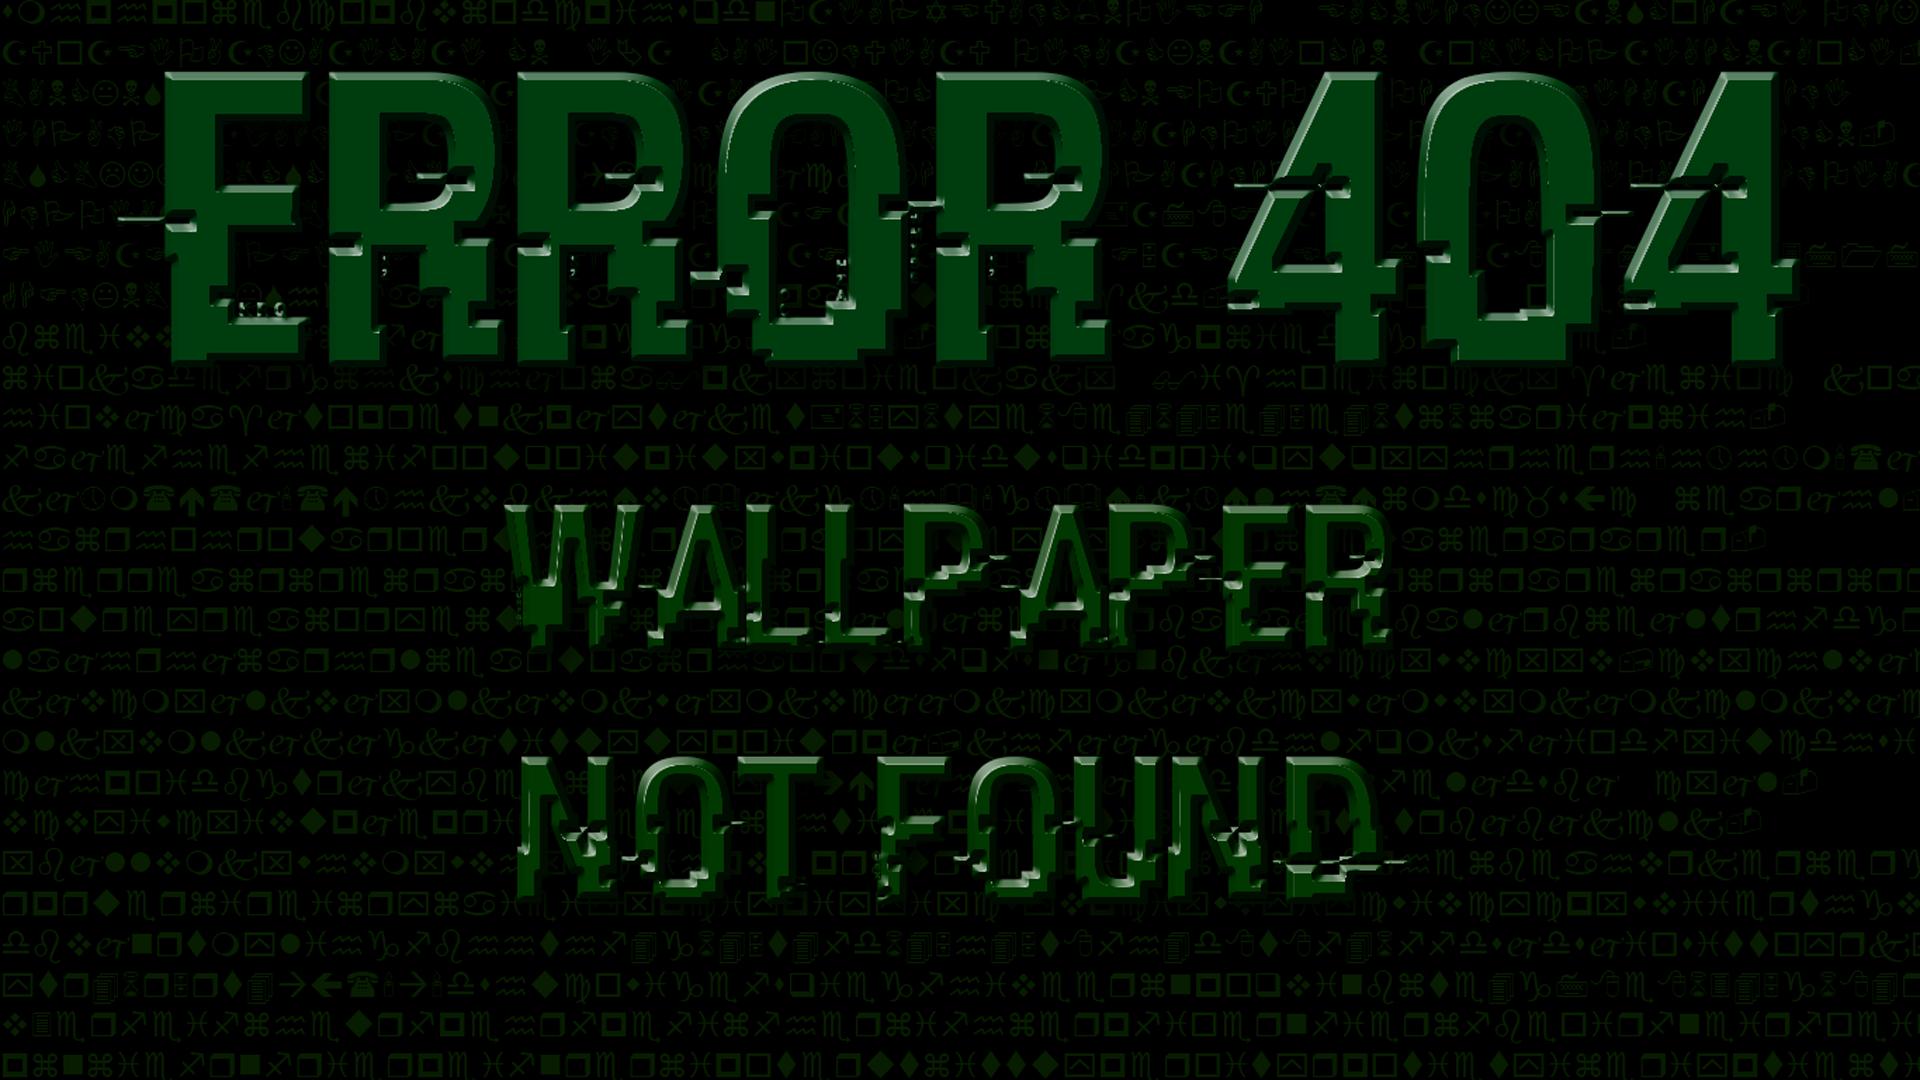 Background image 404 not found - Humor Wallpaper Geek Glitch Wallpaper